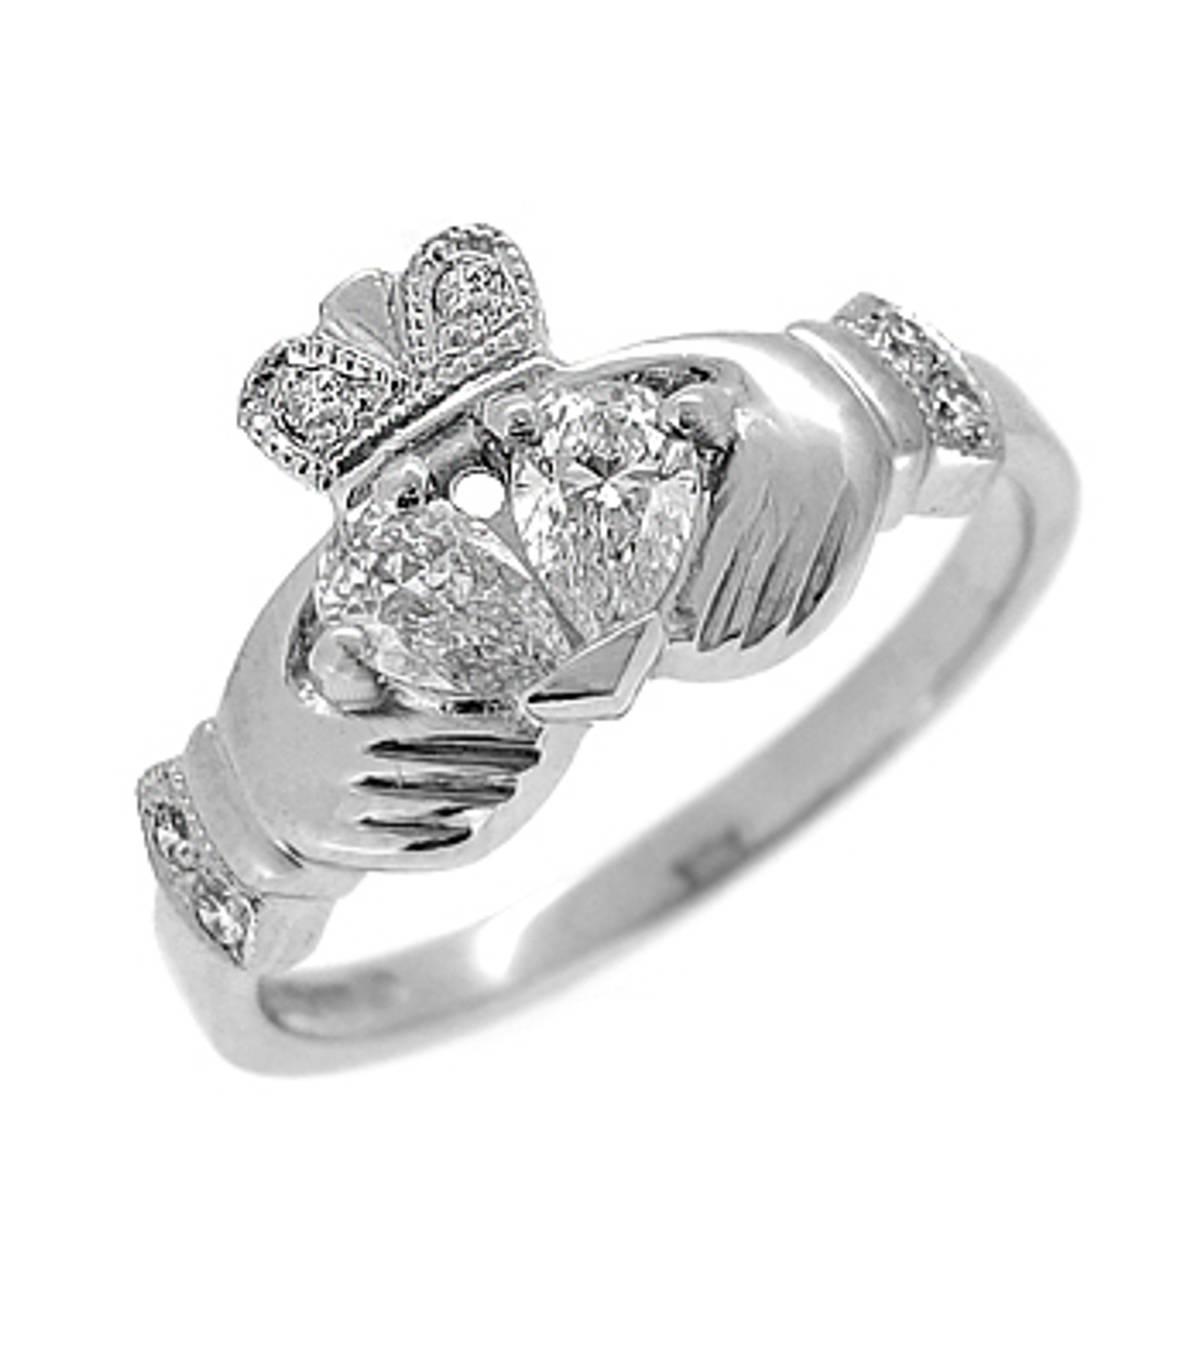 Irish made14 carat white gold 0.34cts/0.06cts diamonds claddagh engagement ring